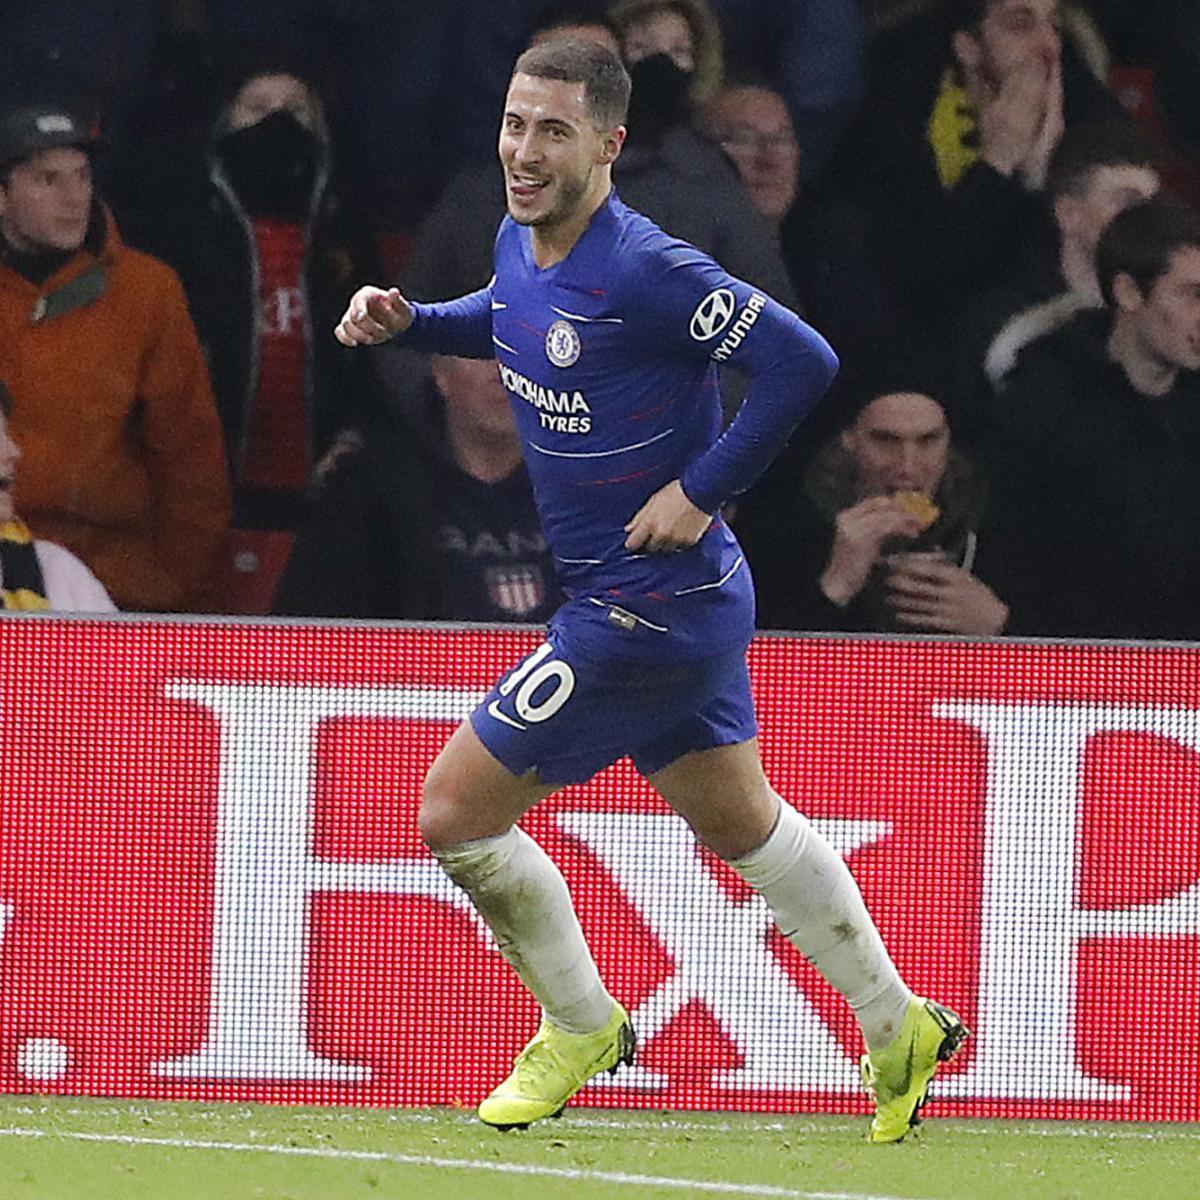 Tottenham 3 Fulham 1 Match Highlights Harry Kane Scores: EPL Results Week 19: Wednesday's 2018 Premier League